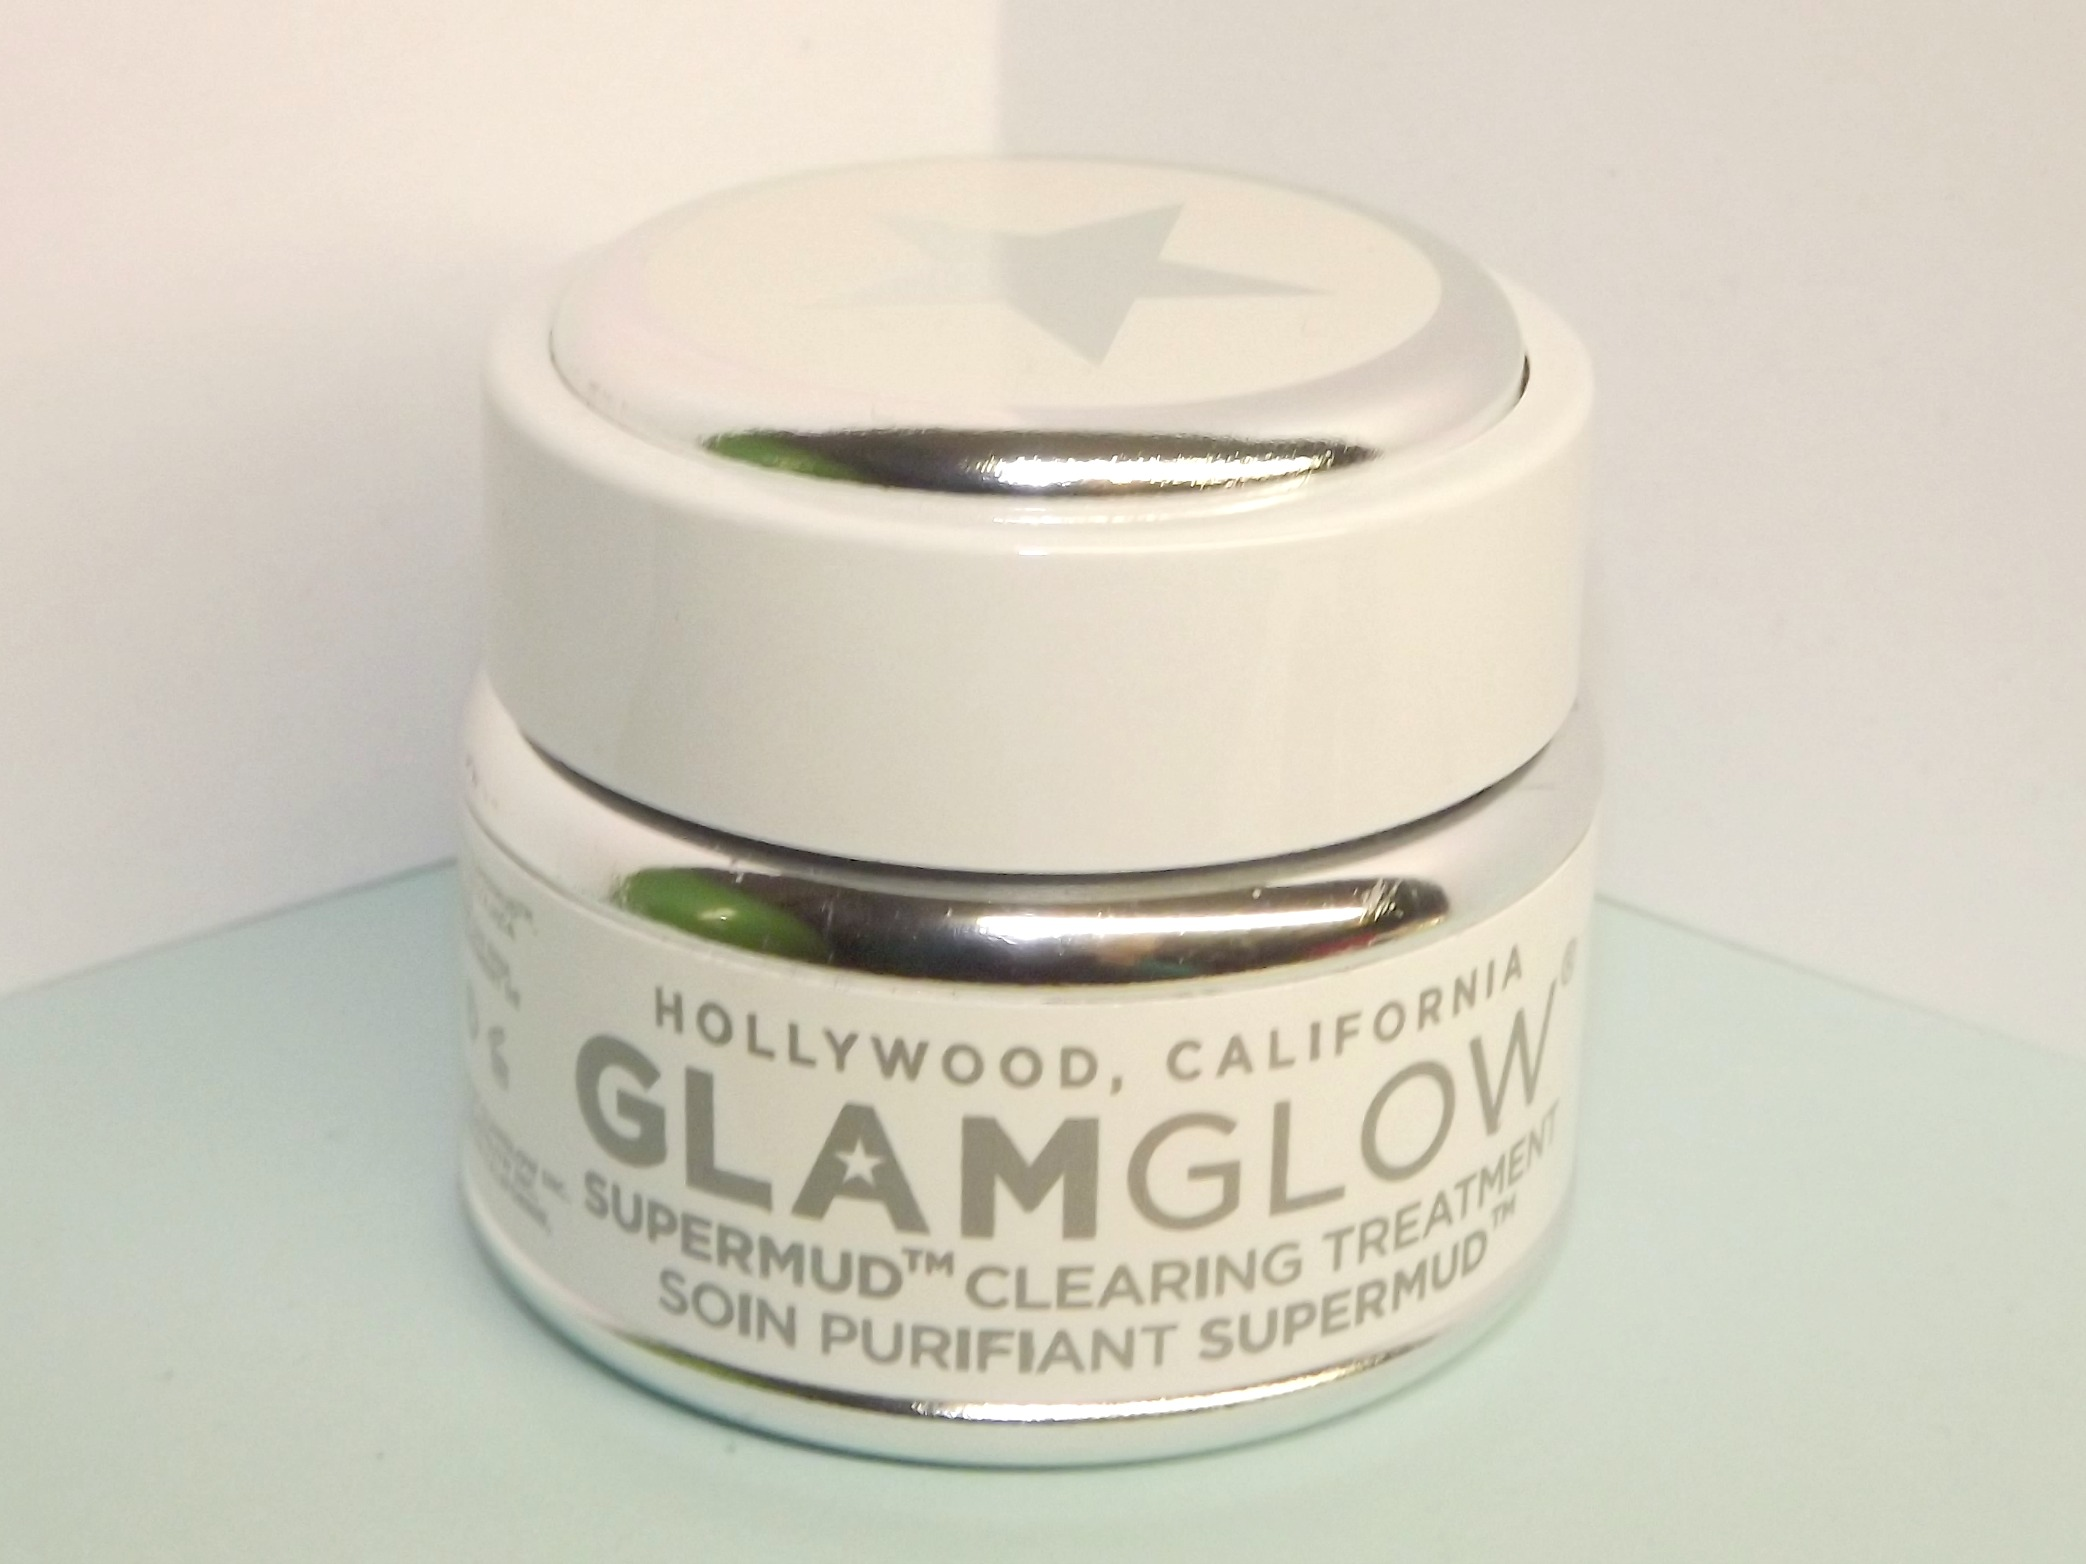 supermud glamglow